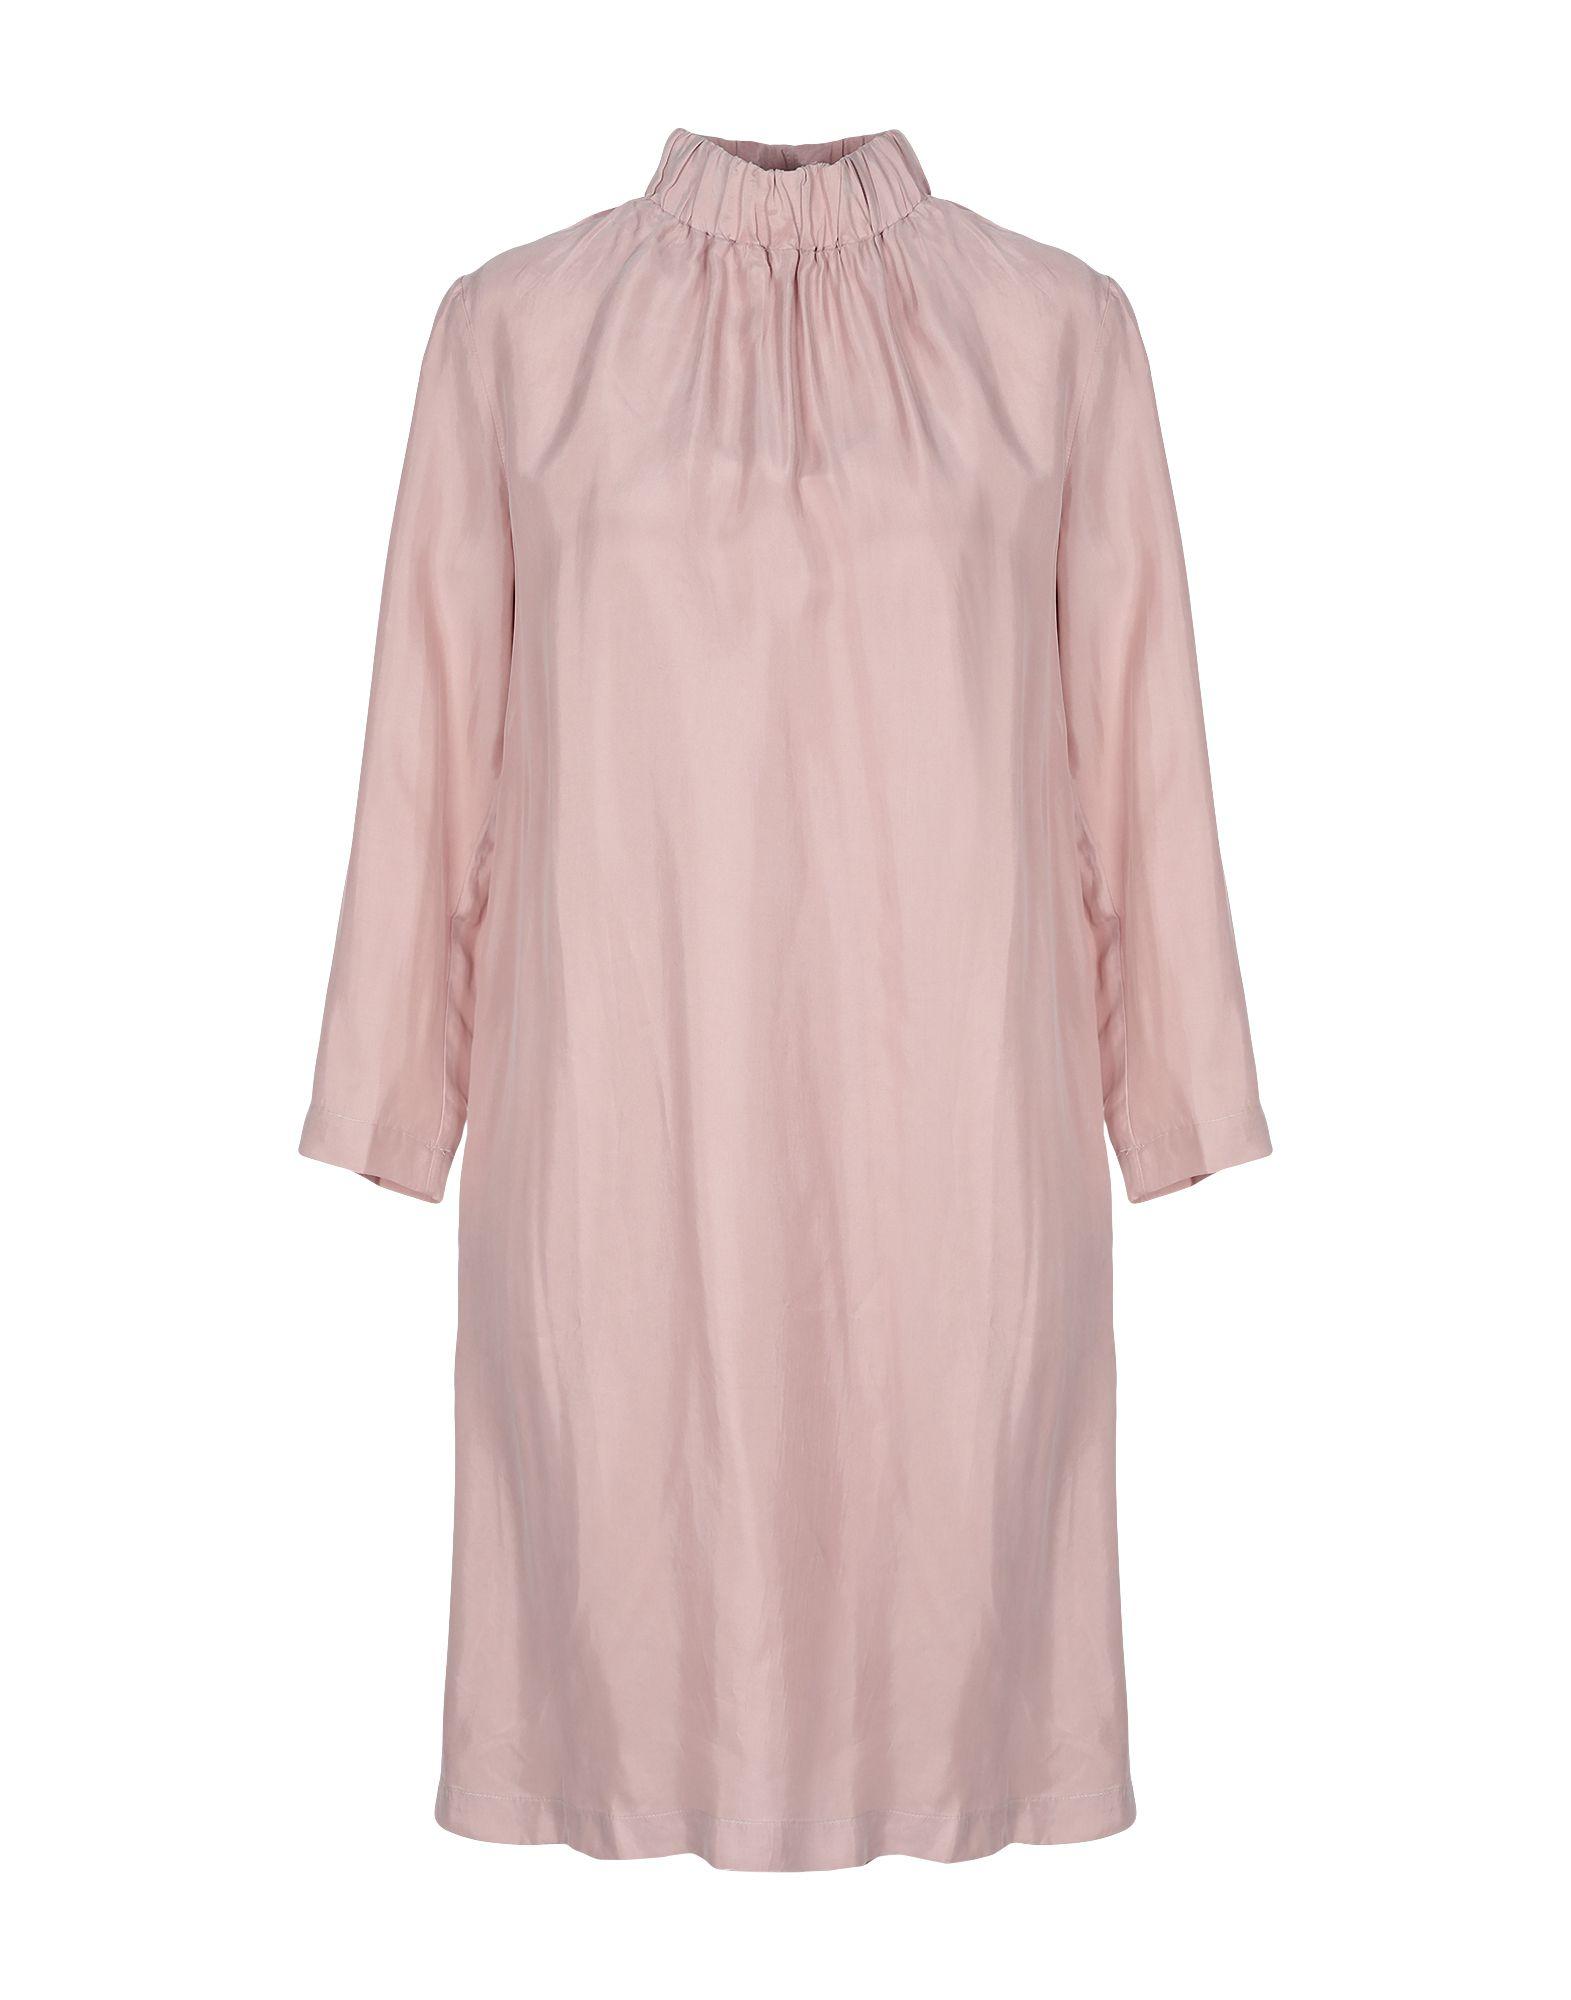 SELECTED FEMME Короткое платье nouvelle femme короткое платье